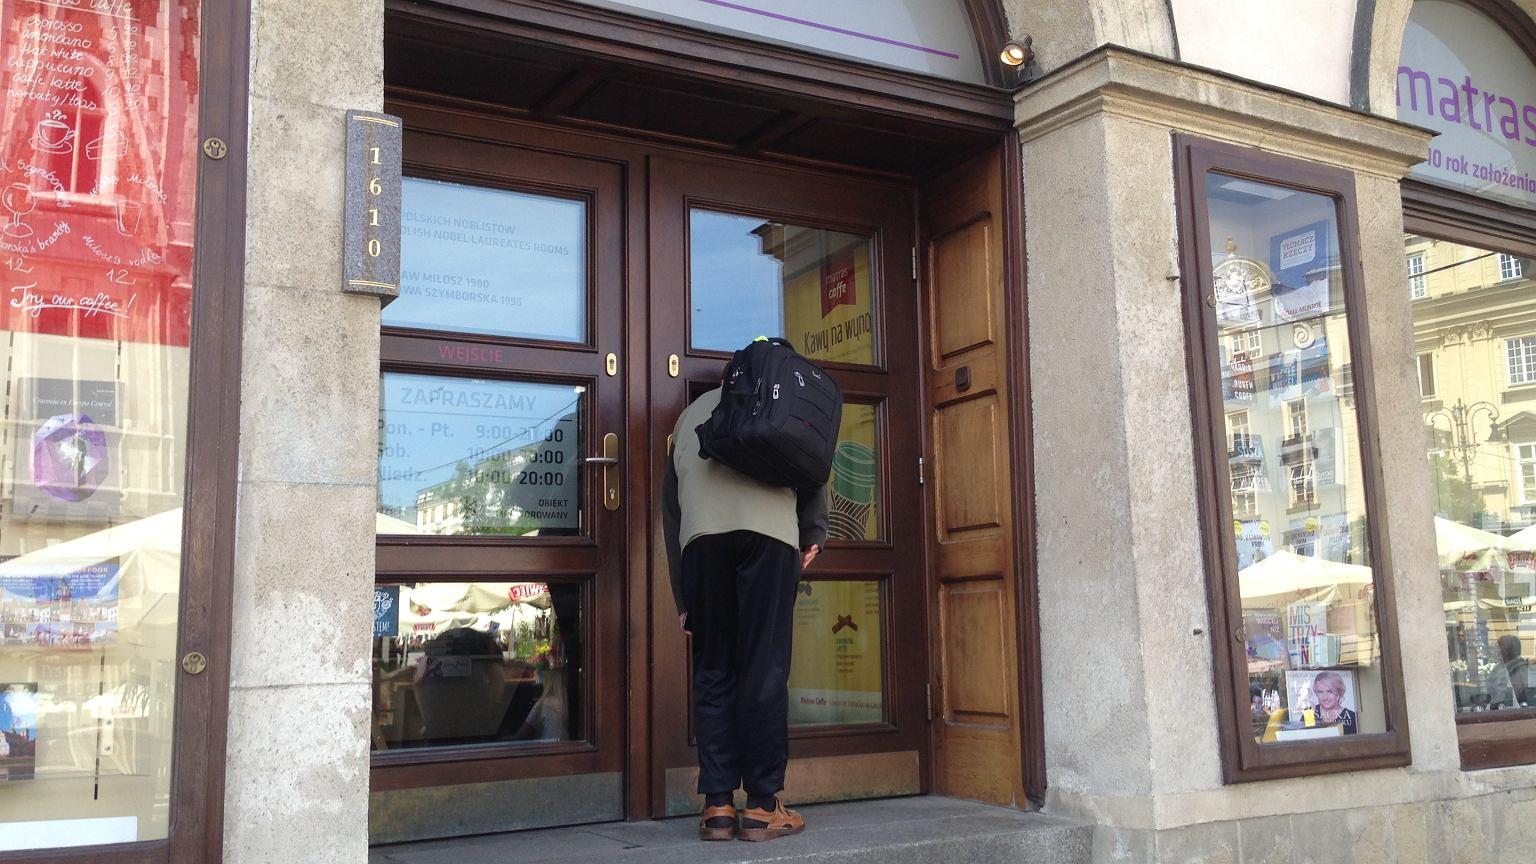 Nowa księgarnia matras elbląg ch ogrody facebook